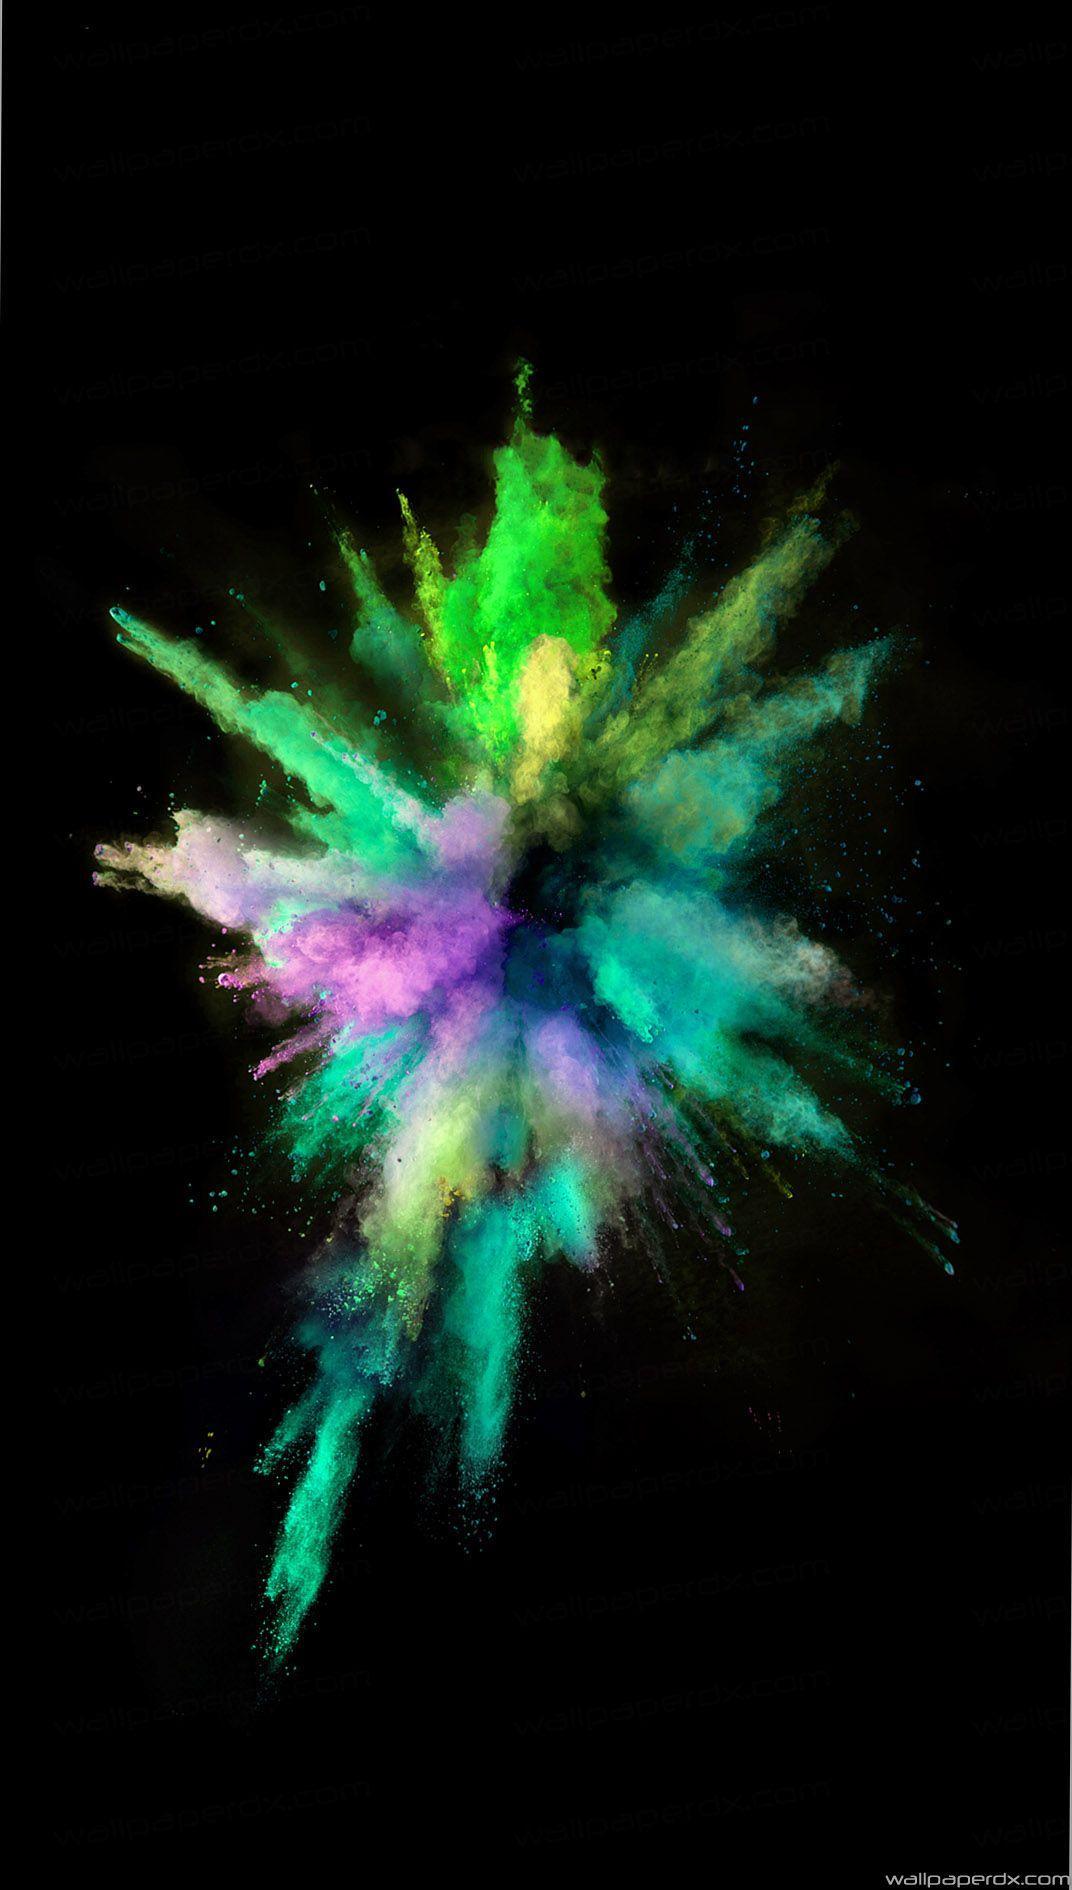 bdf57e3ad38 1080x1920 Logo Art Apple Rainbow Minimal Dark #iPhone #6 #plus #wallpaper  ...